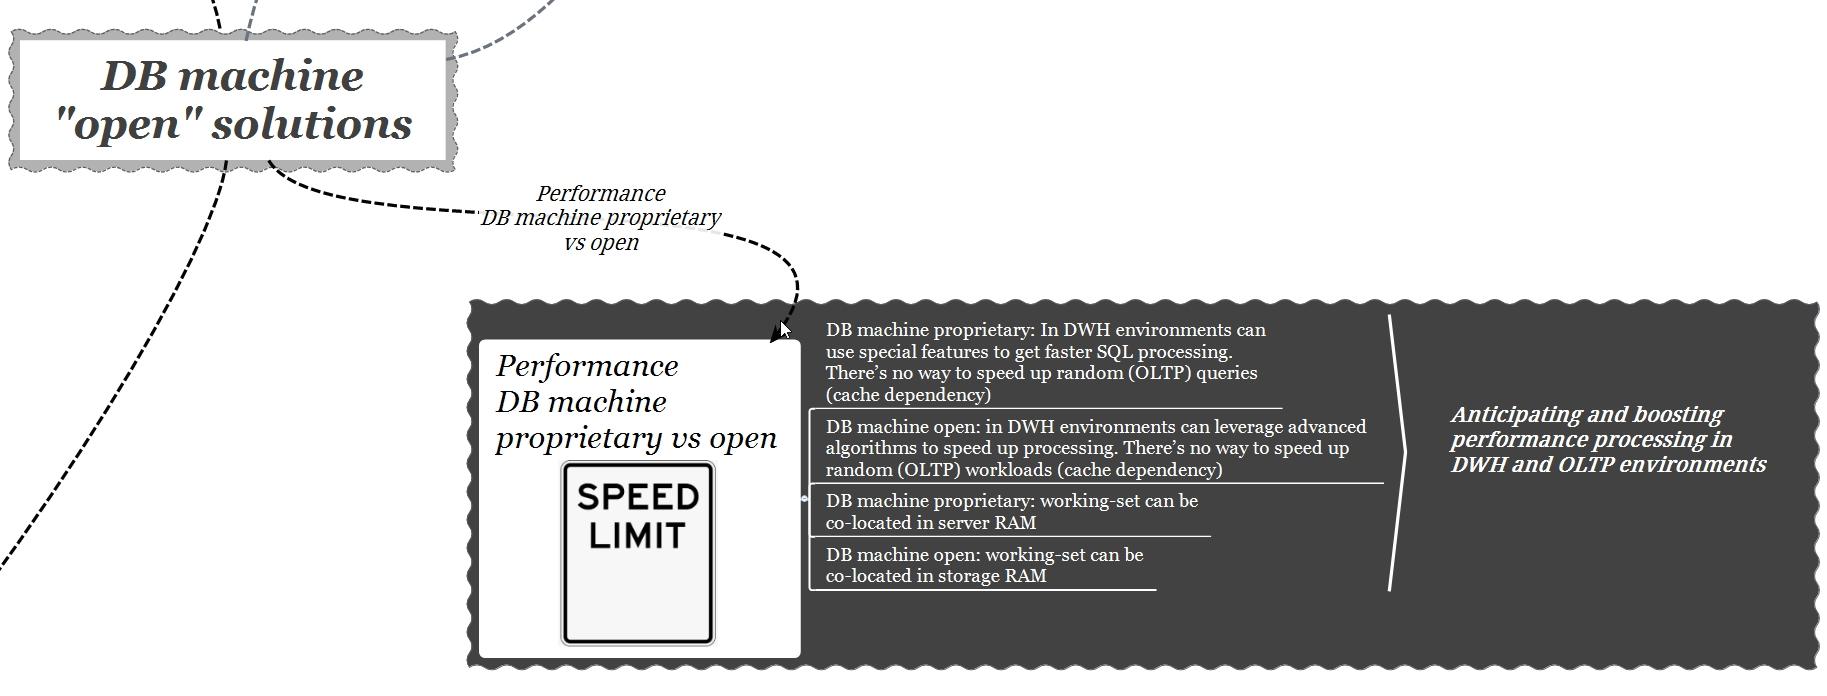 db machine open - performance